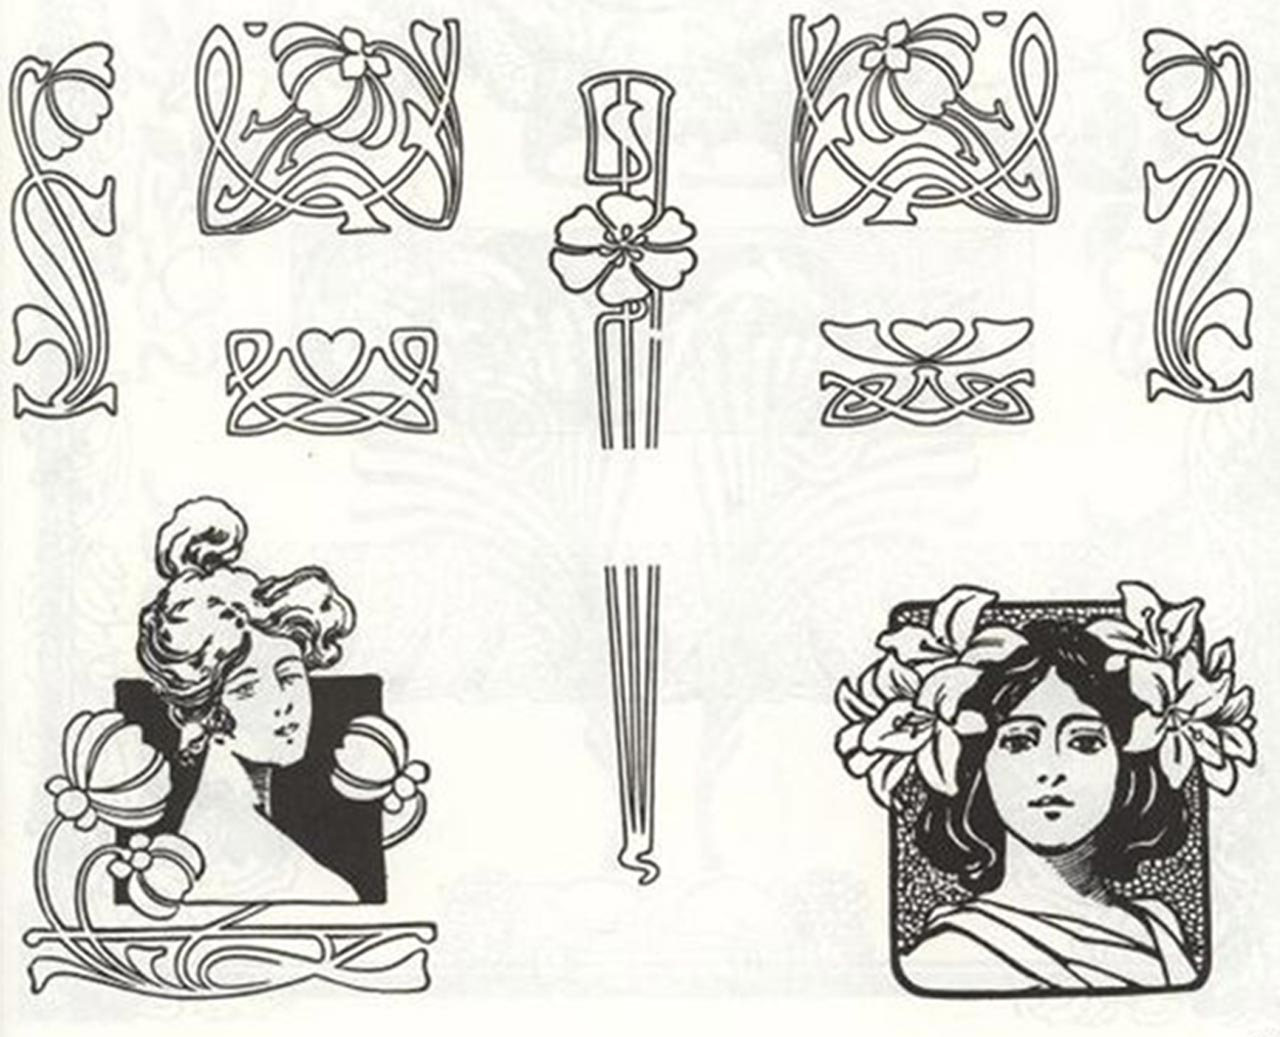 họa tiết art nouveau